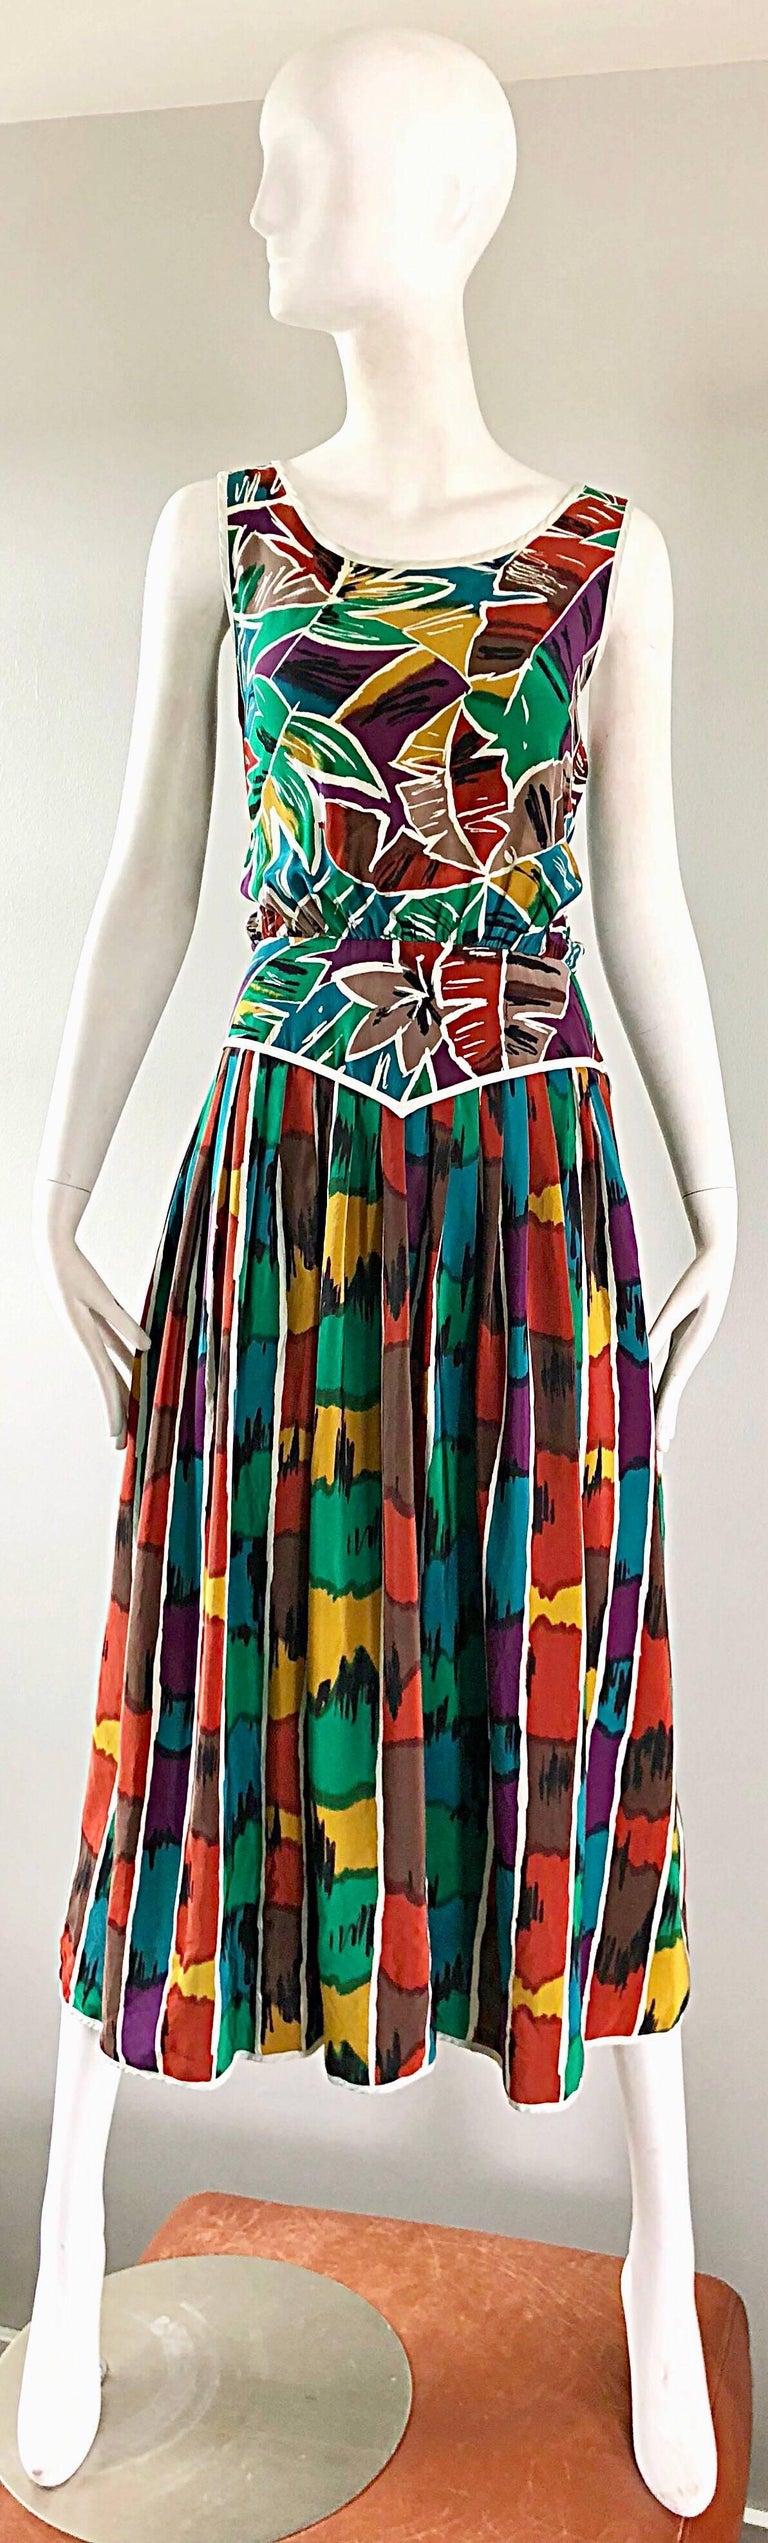 Vintage Oscar de la Renta Size 8 / 10 Kaleidoscope Print Silk Sleeveless Dress For Sale 11